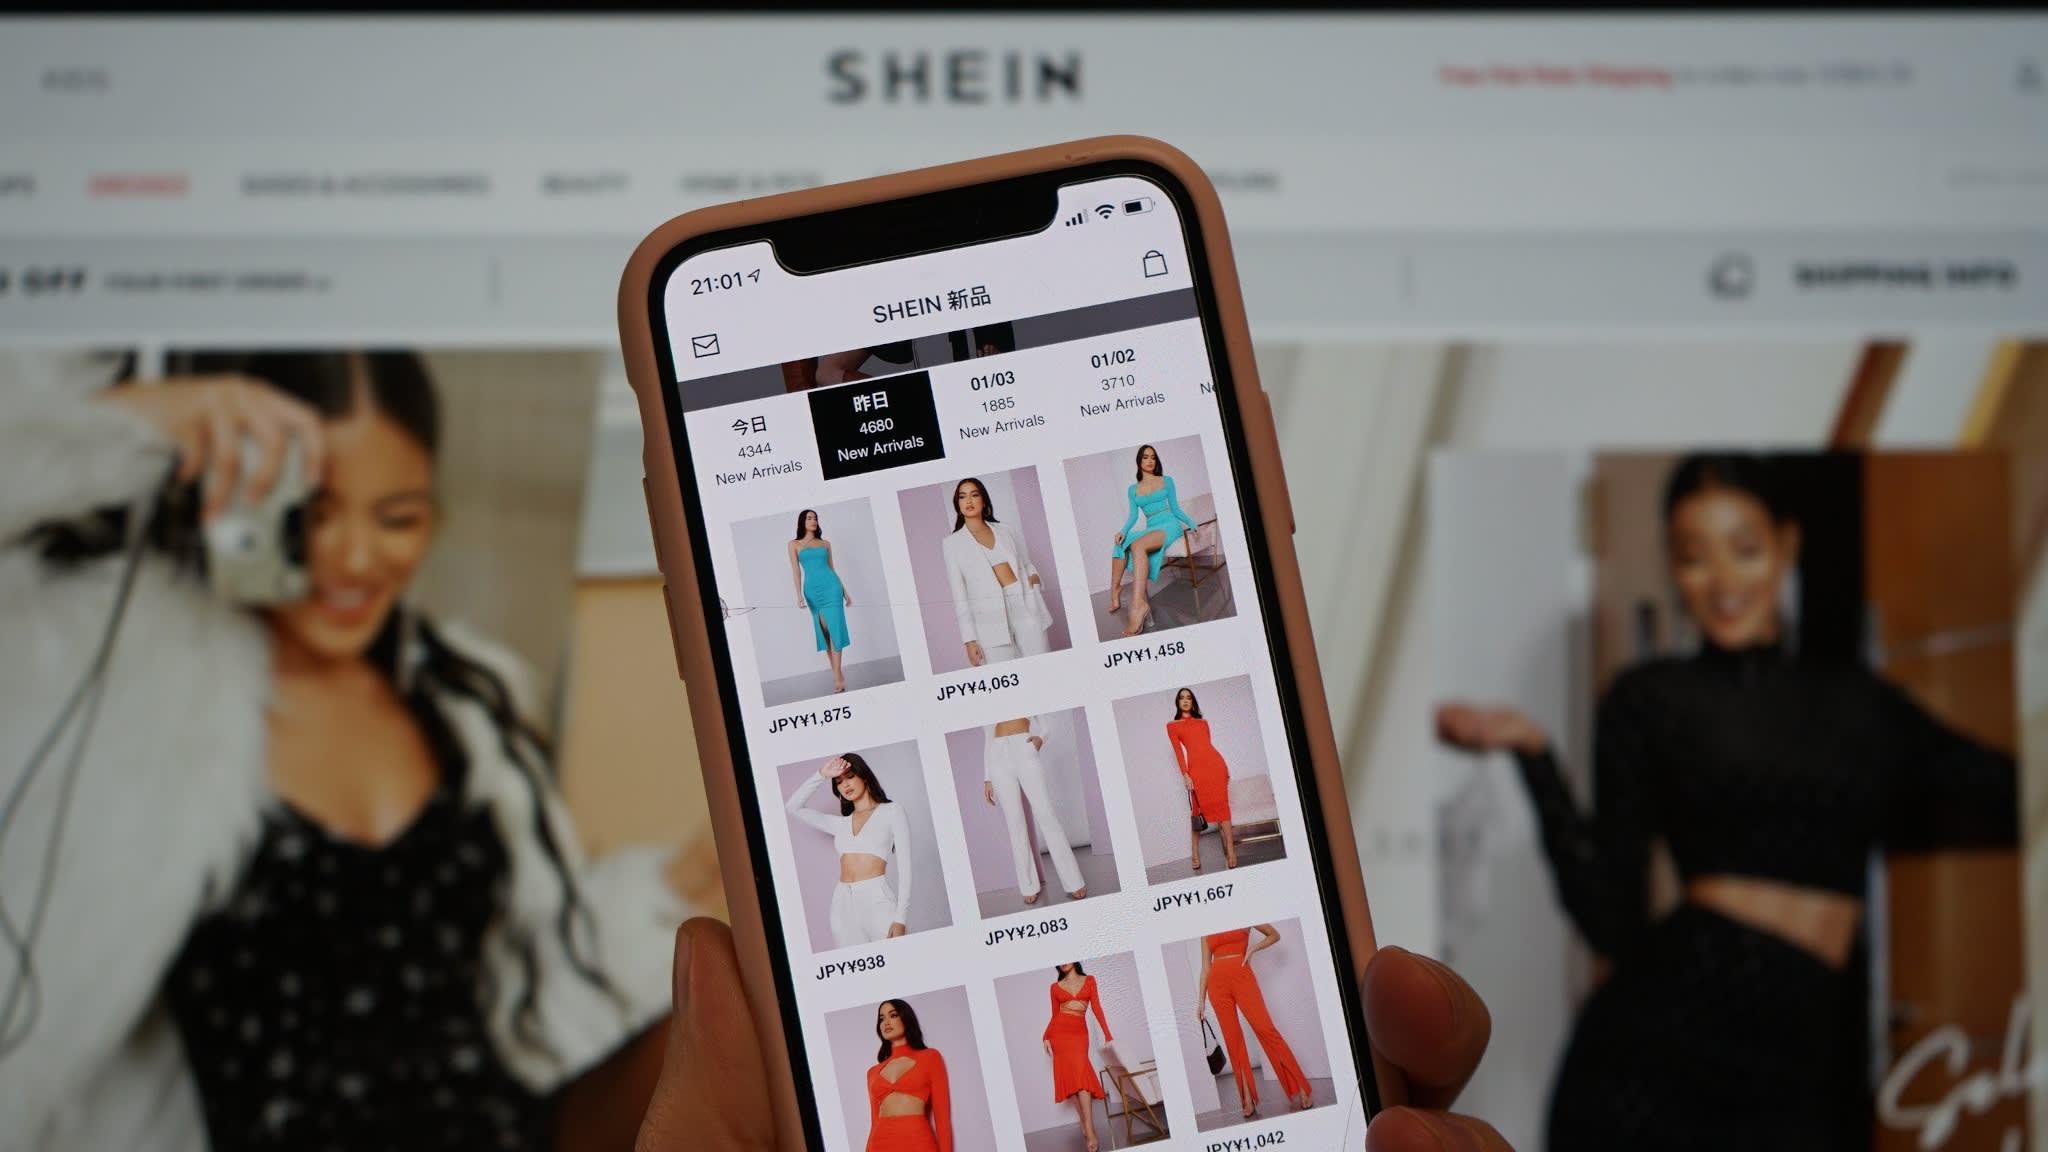 Giao diện chính của website Shein. Ảnh: Nikkei